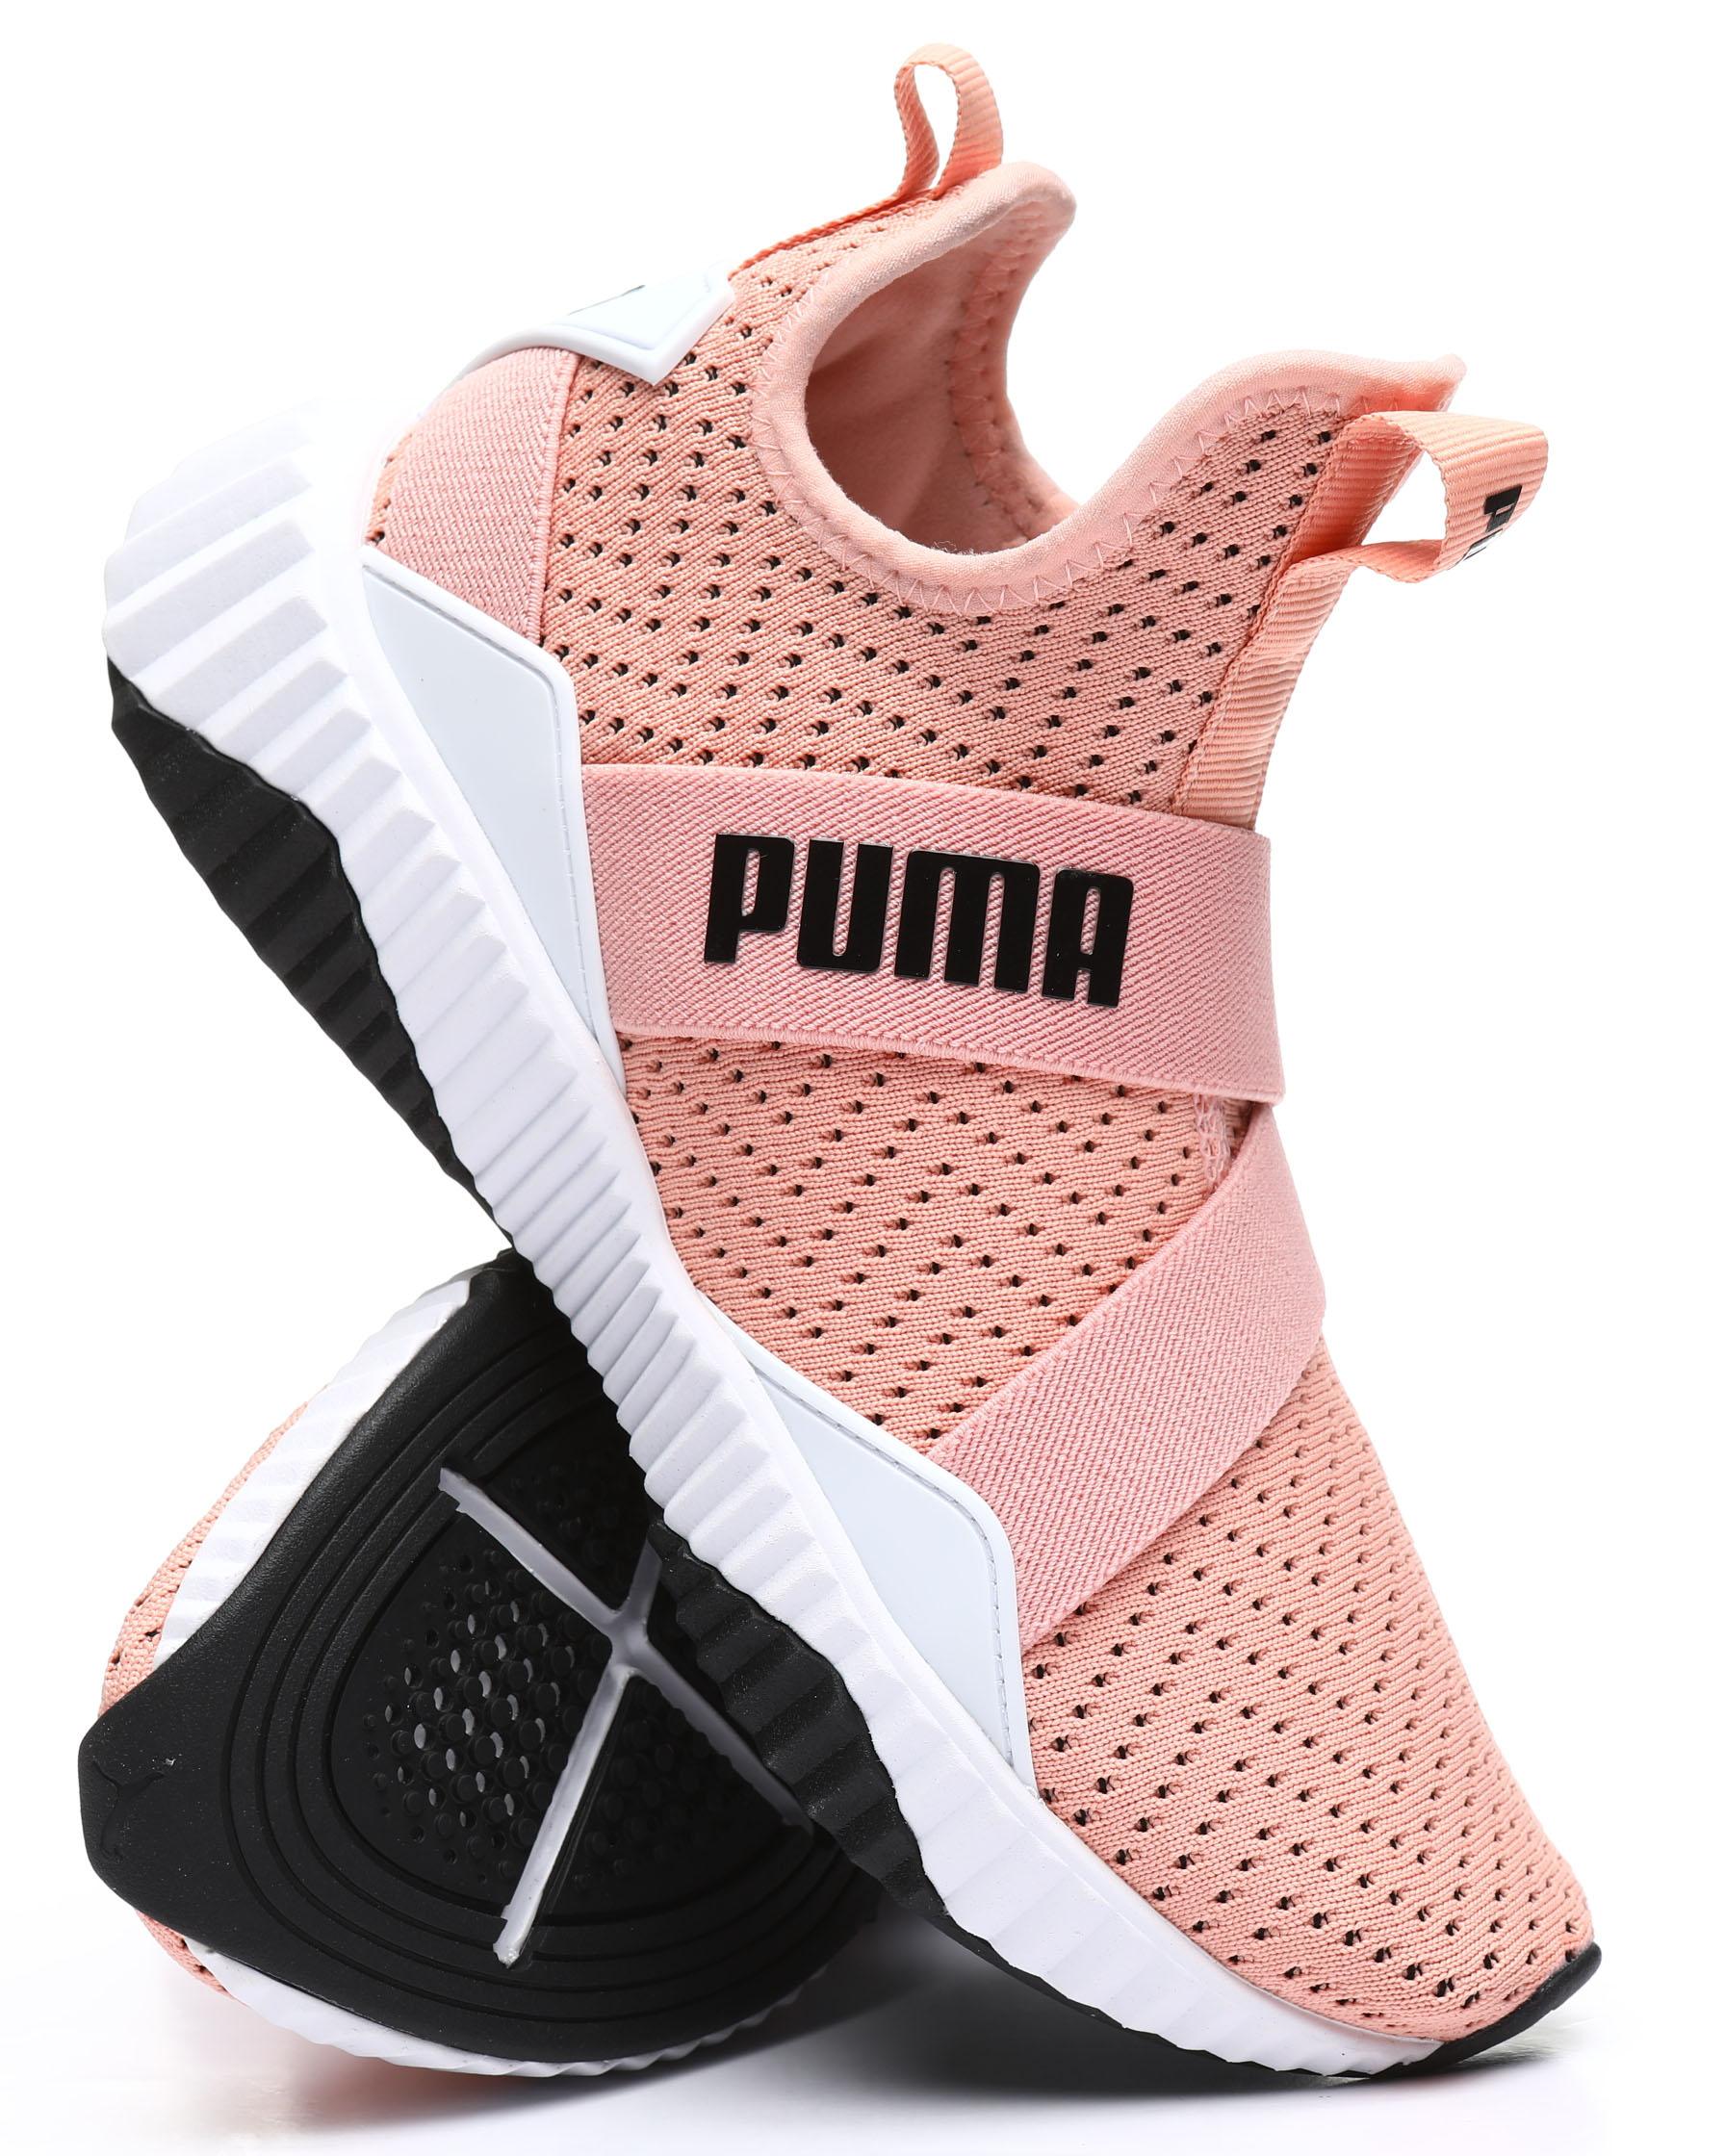 Puma Defy Mid Varsity Women's Shoe NWT